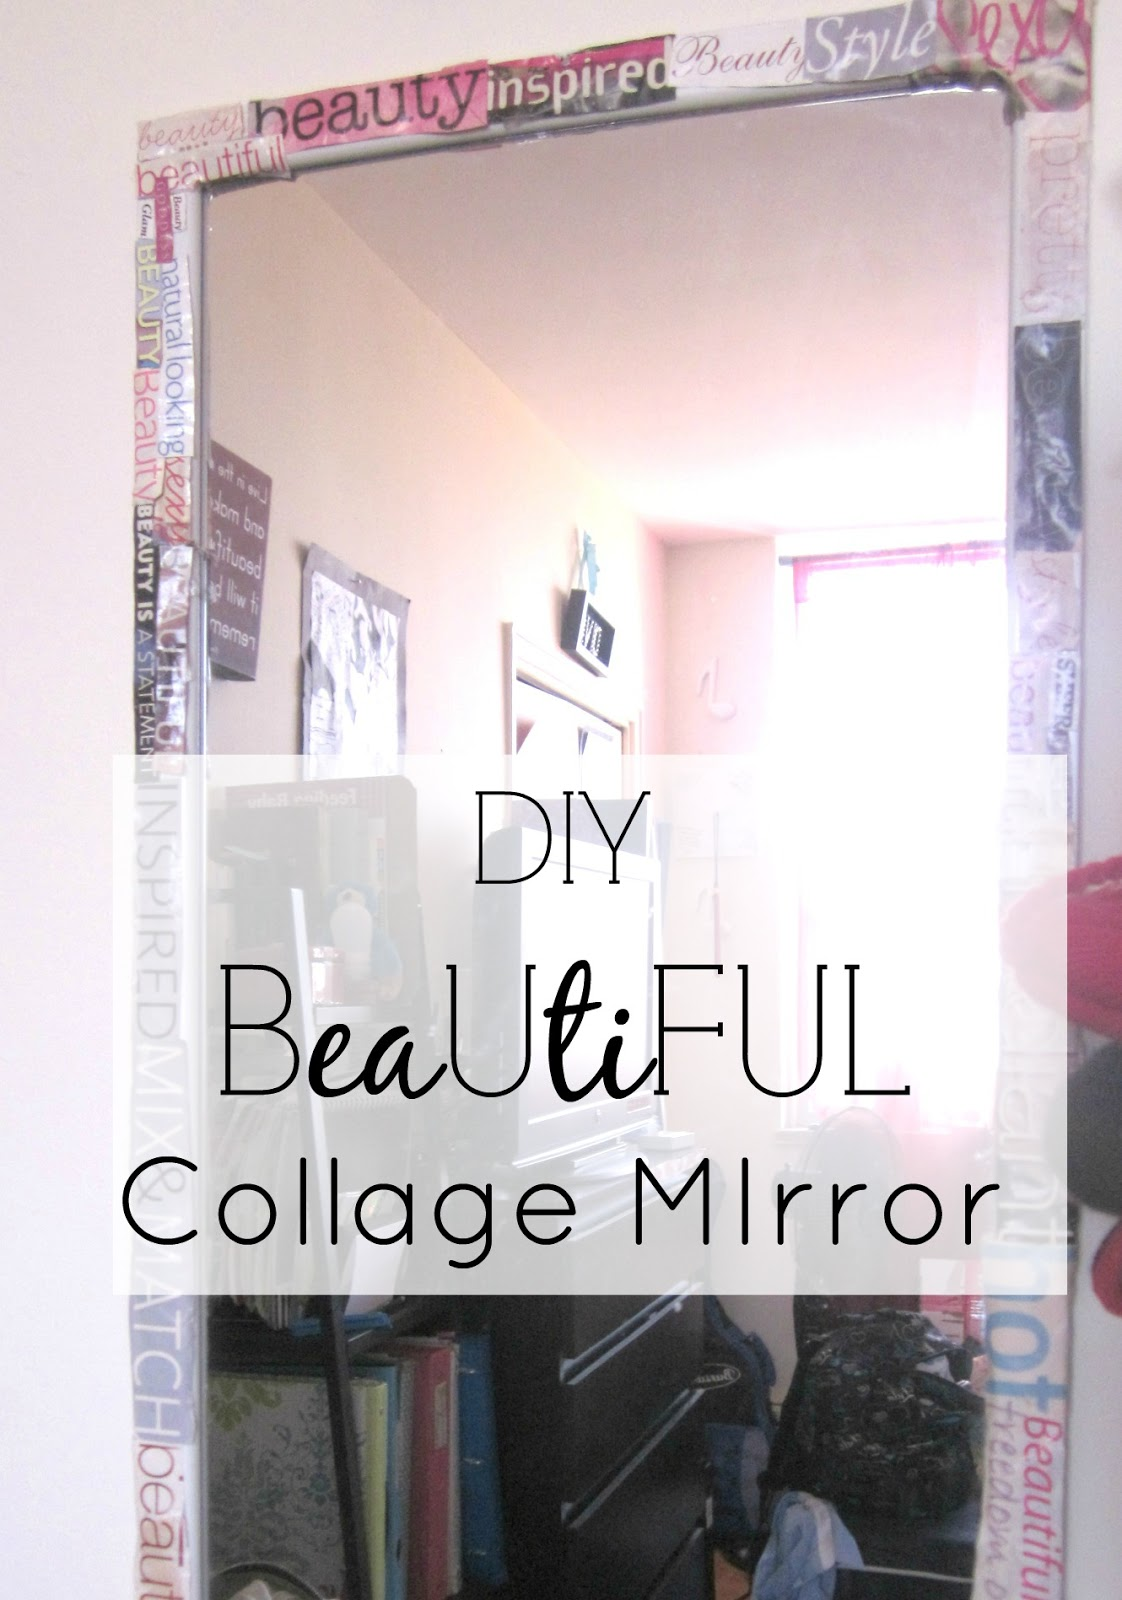 diy collage mirror, self esteem